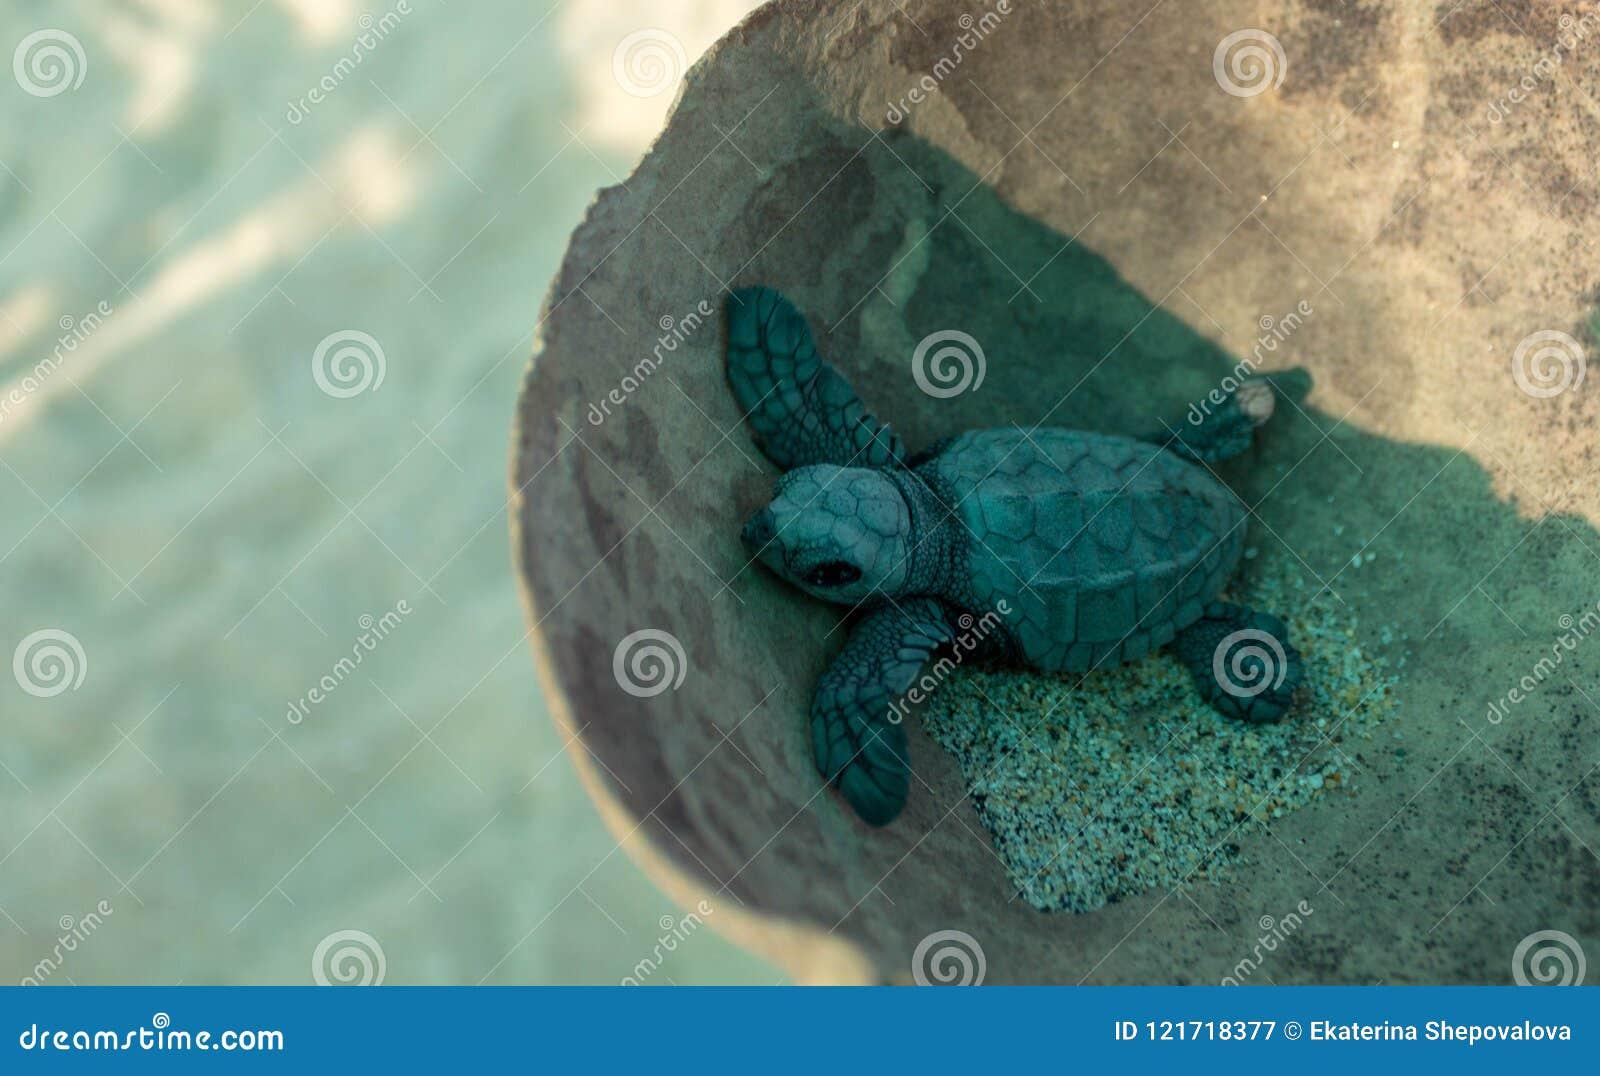 Babyturtle tortuga tortoiseshell